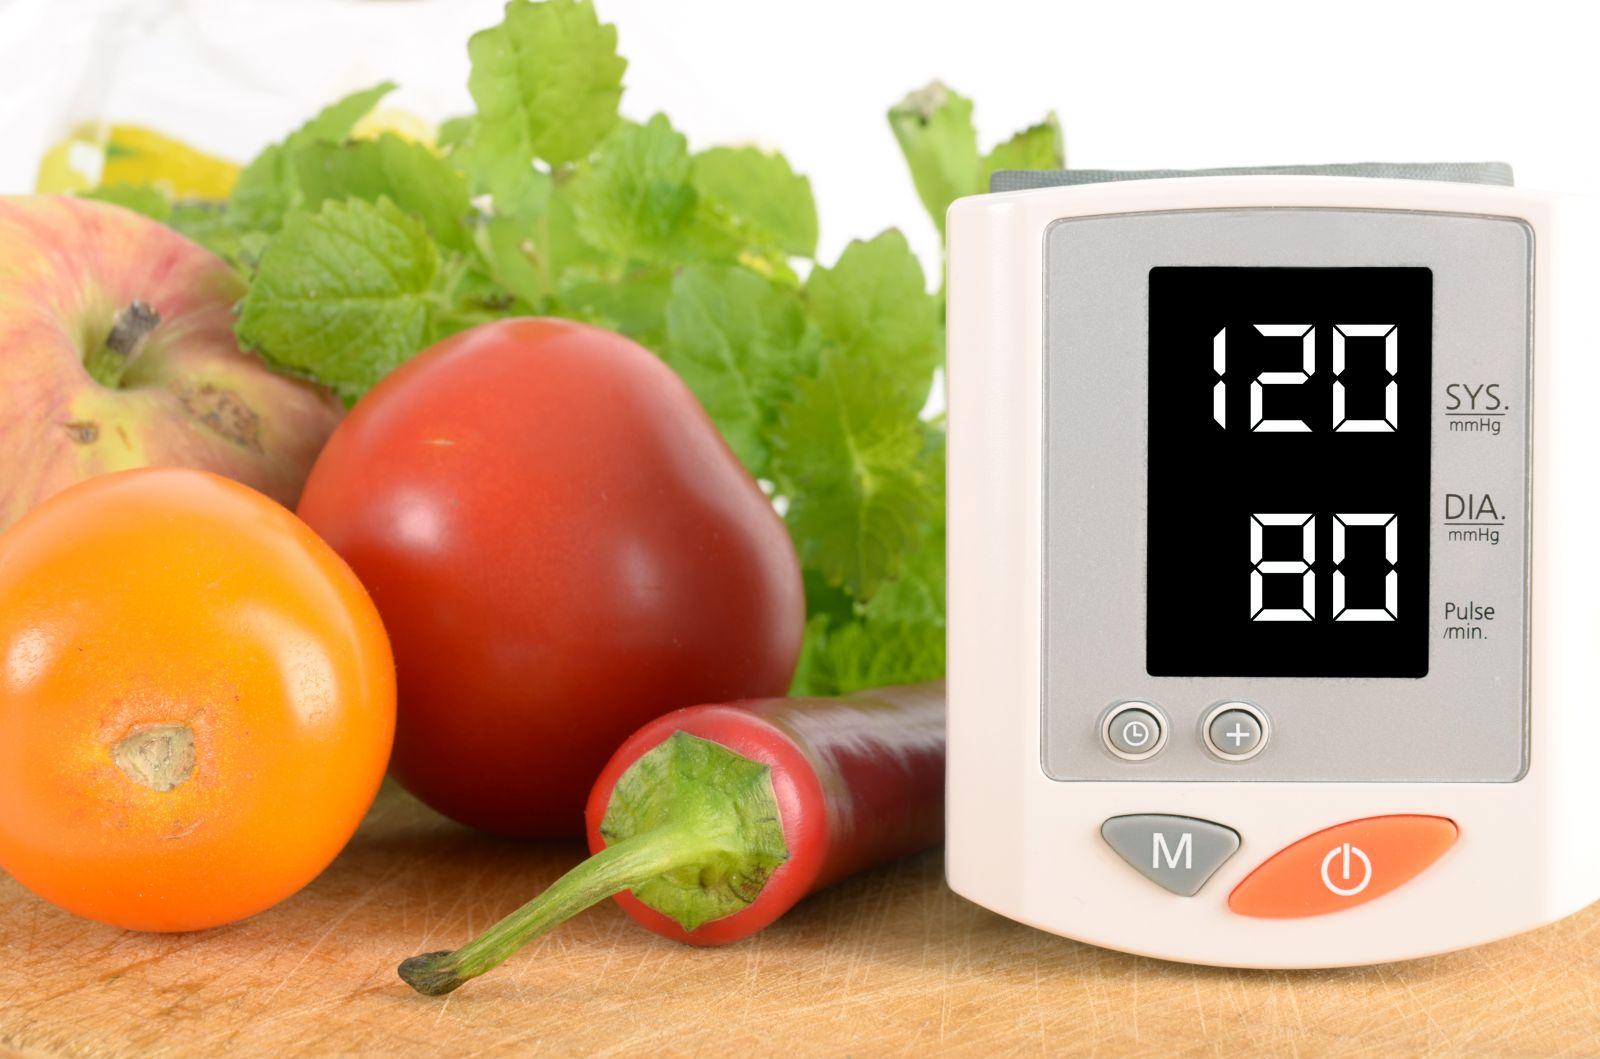 magas vérnyomás paradicsom sbiten népi magas vérnyomásban